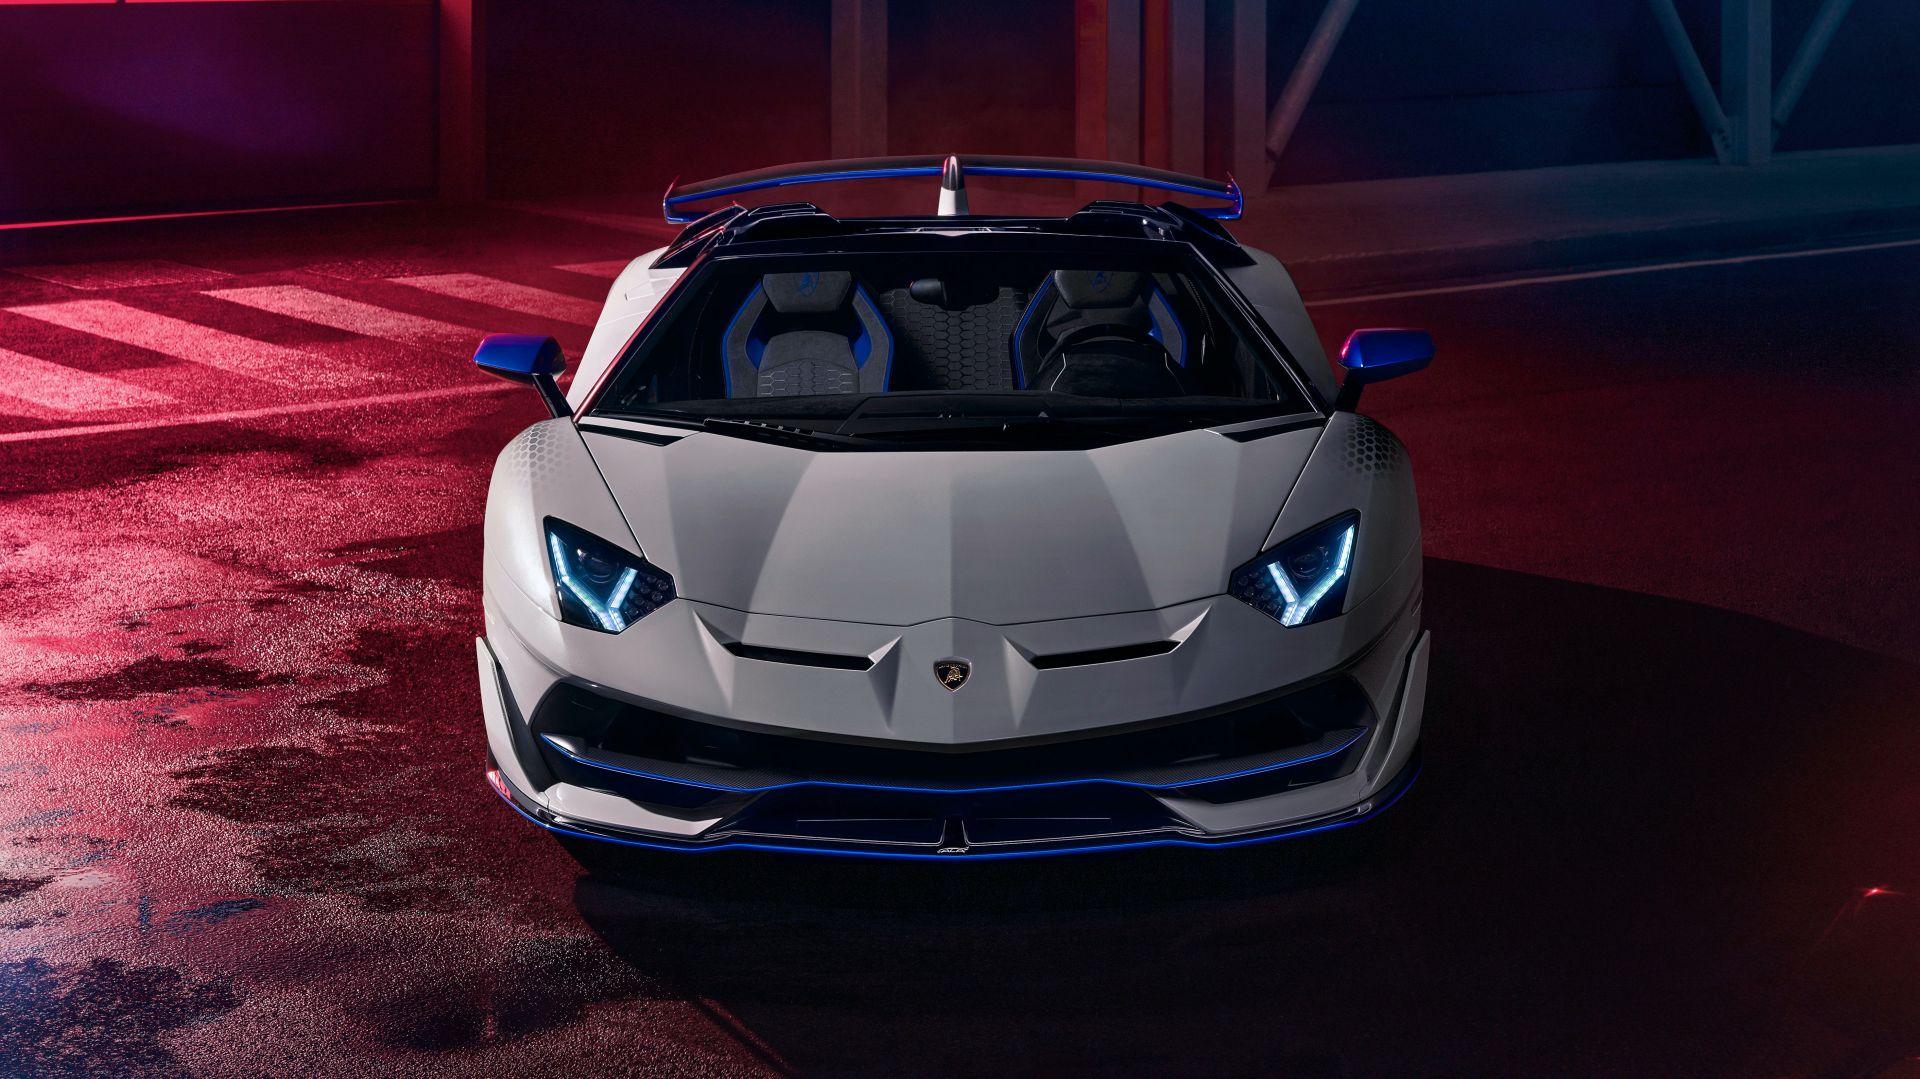 Lamborghini-Aventador-SVJ-Xago-Edition-3